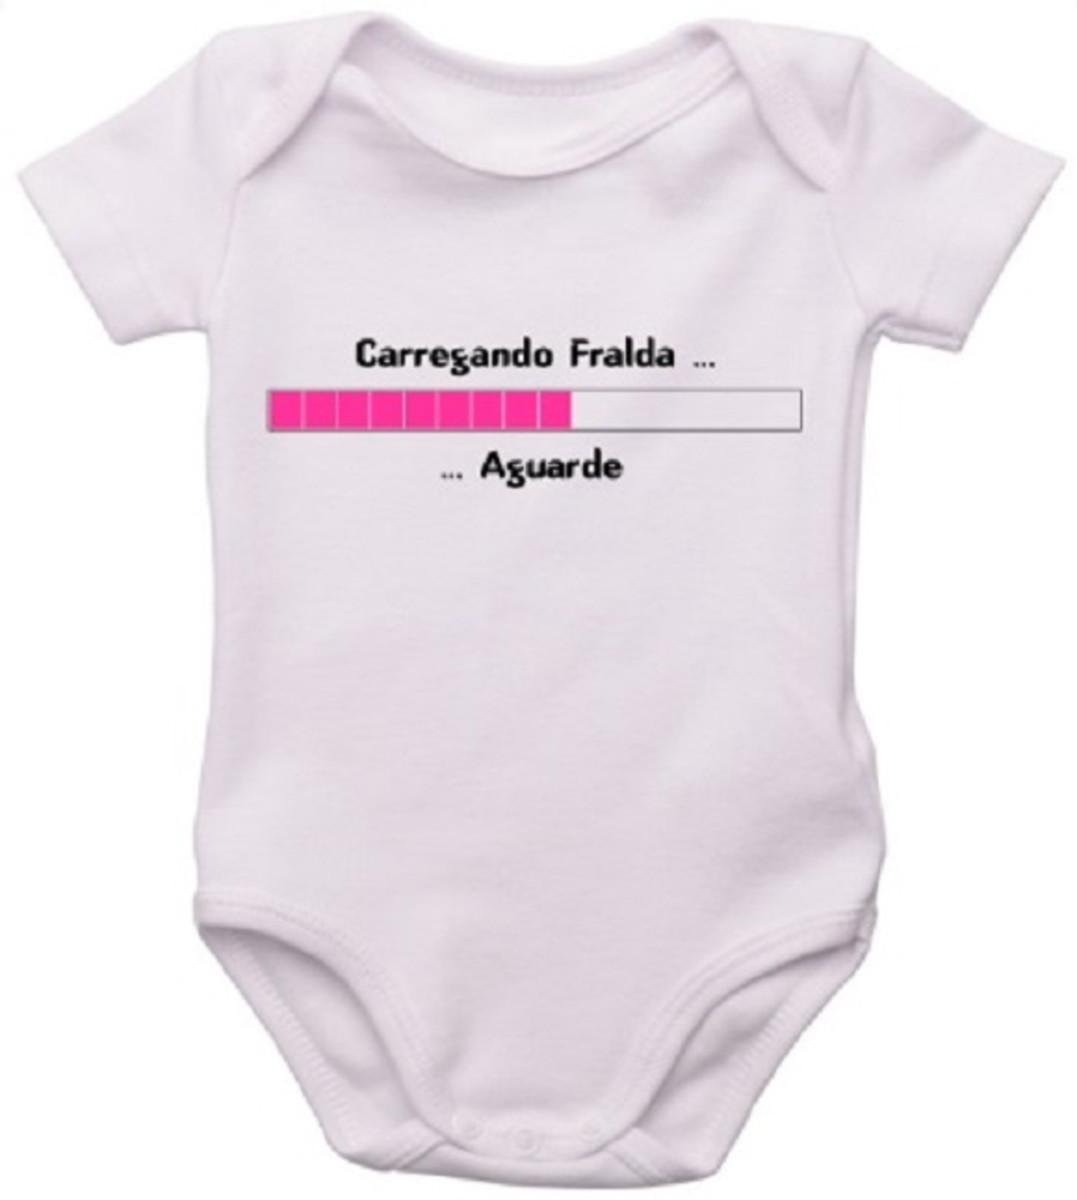 4f393d10a Body Bori Borie Infantil Bebe Personalizado Carregando frald no Elo7 ...